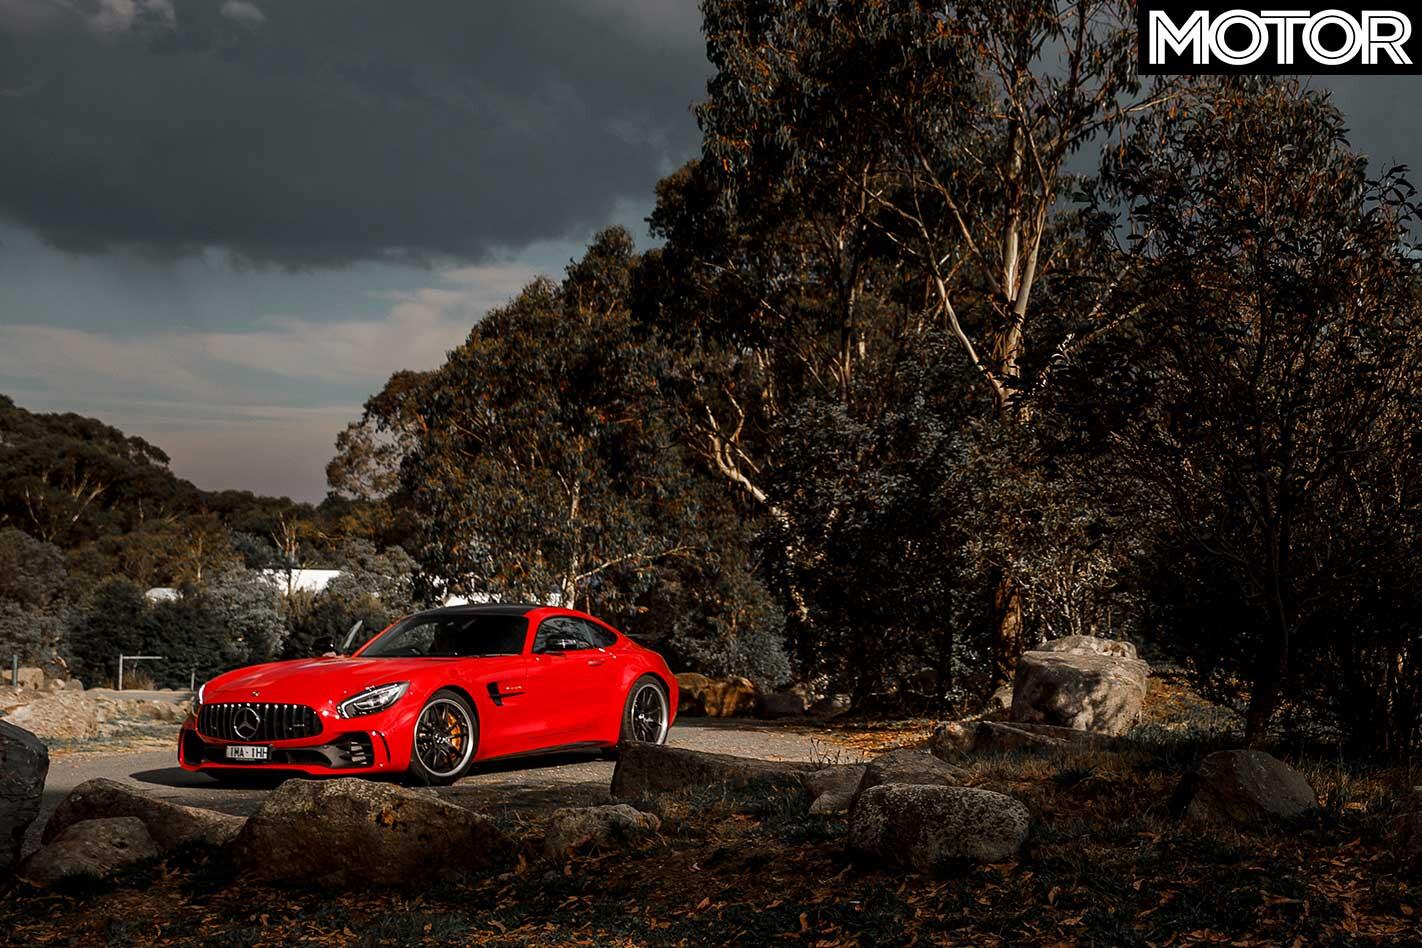 2019 Mercedes AMG GT R 12 Hours Review Rain Clouds Jpg